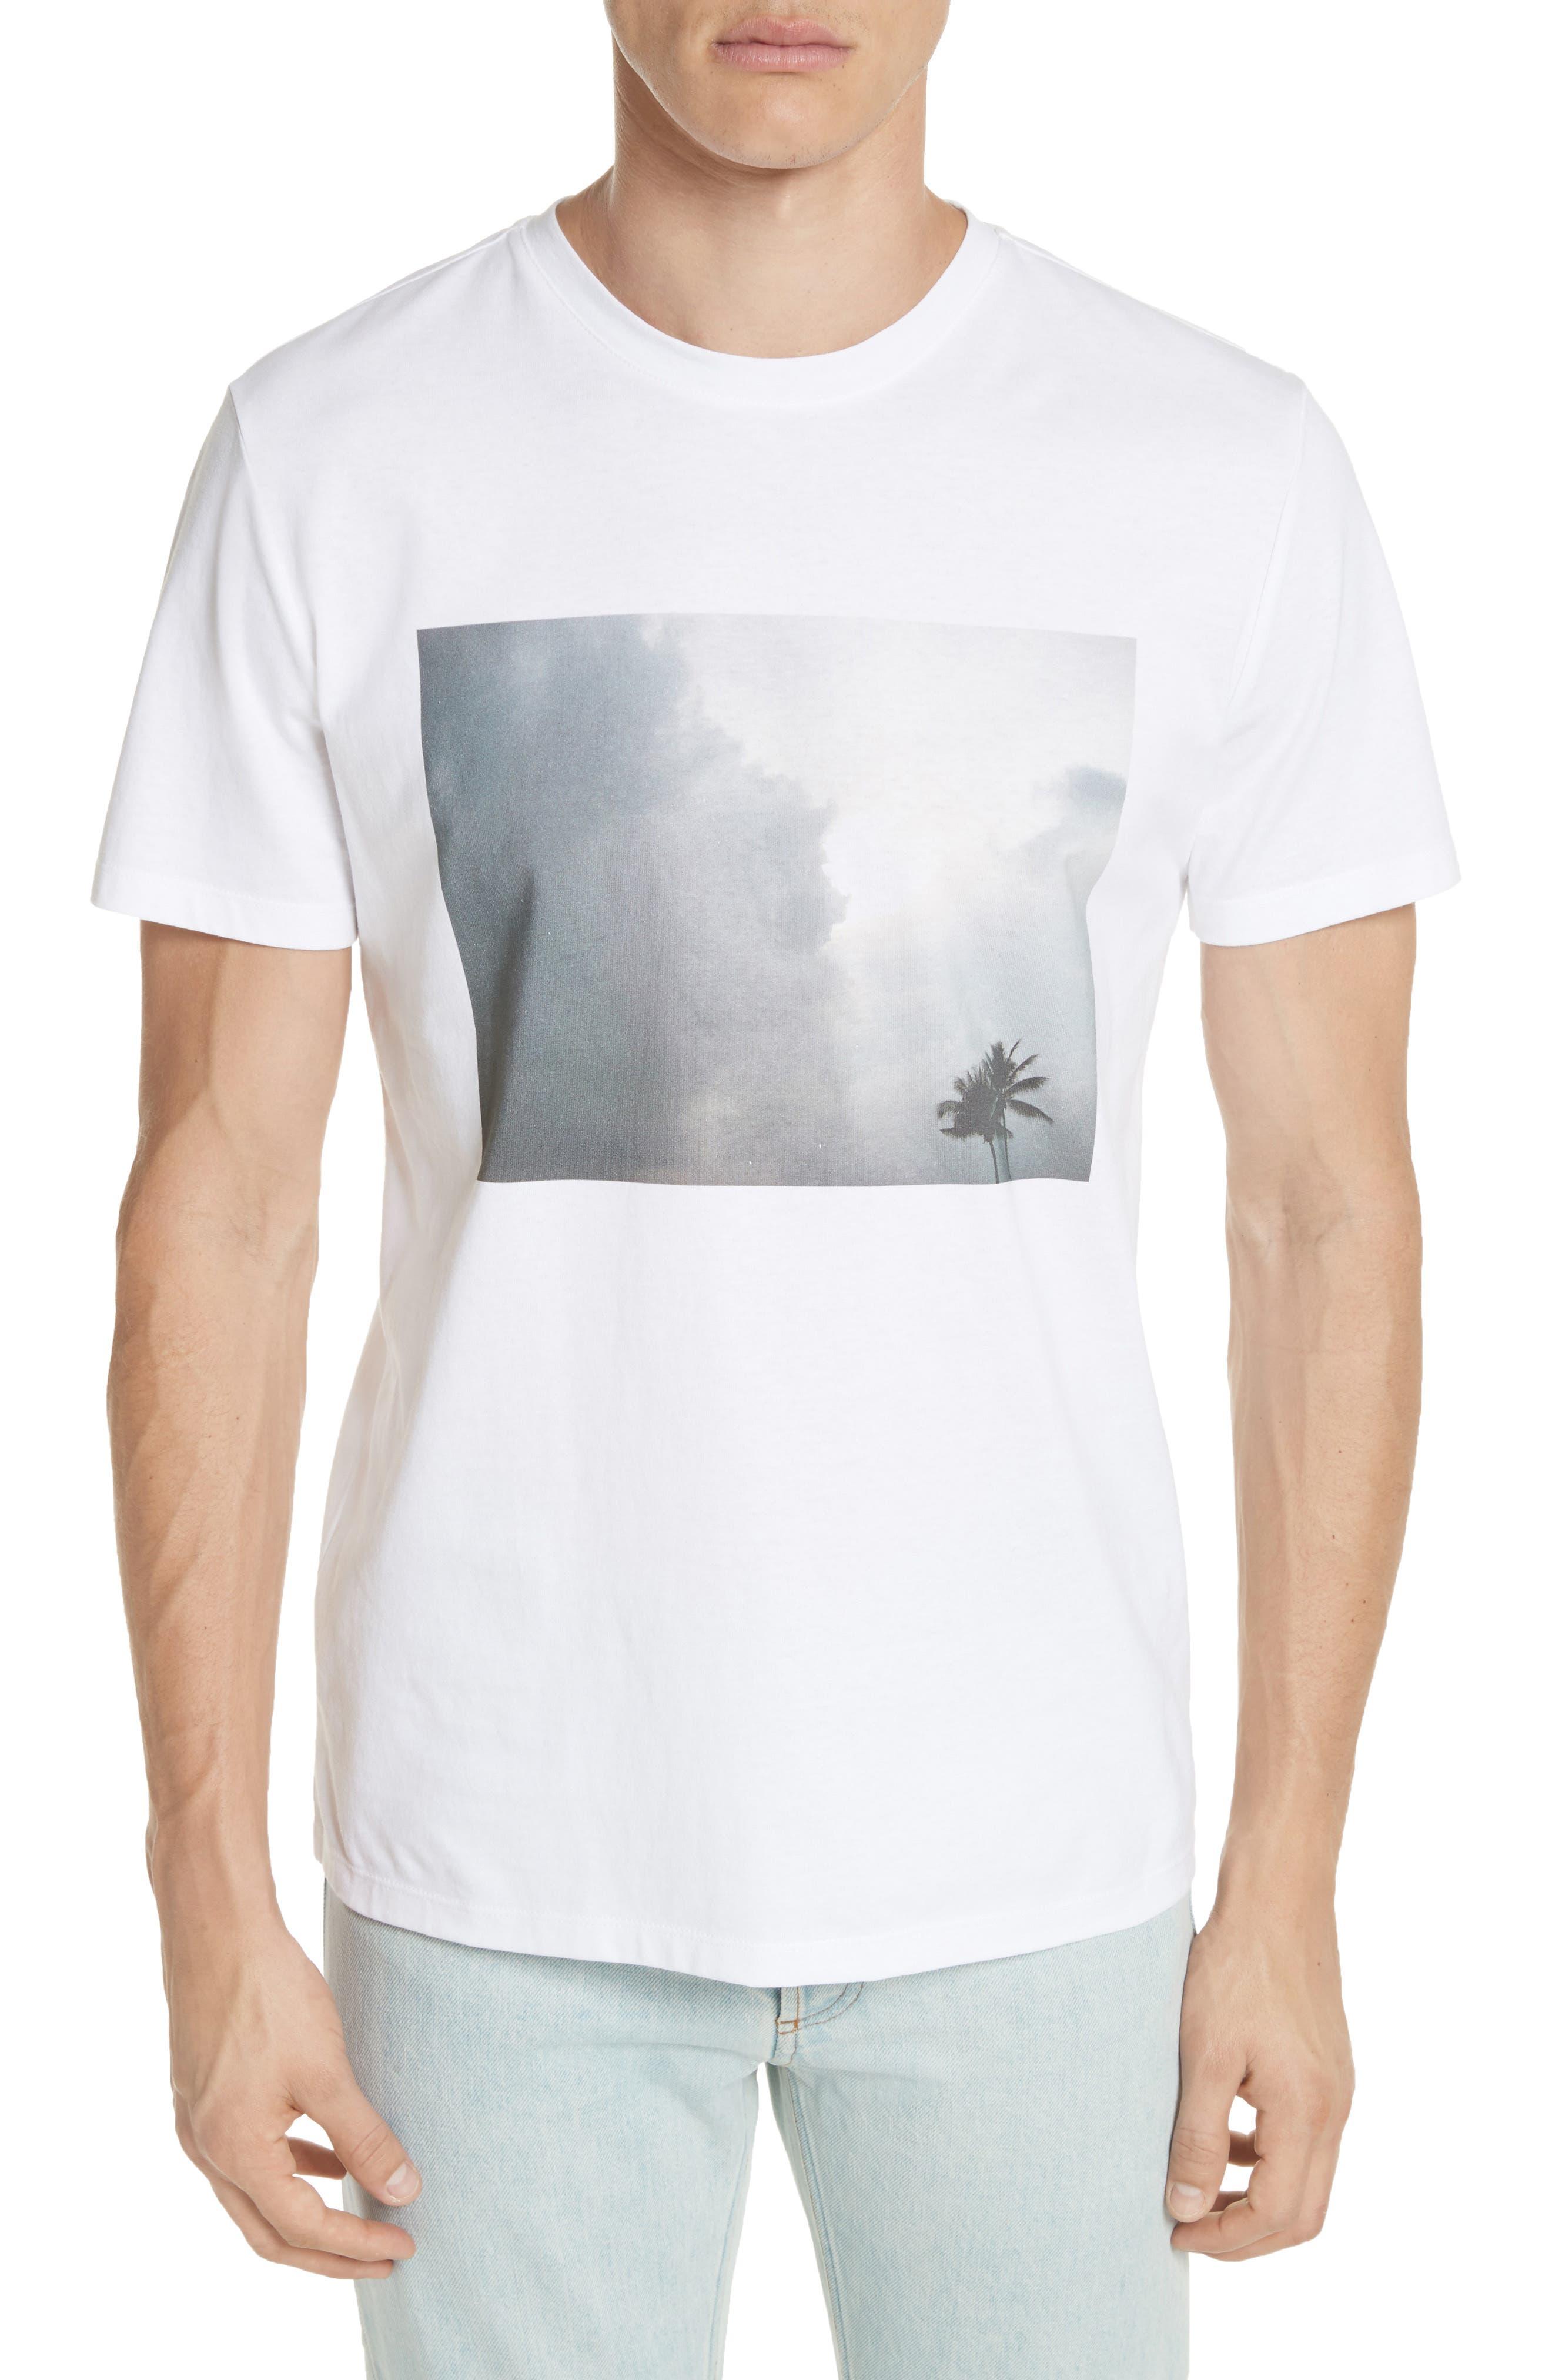 Tropicool Graphic T-Shirt,                         Main,                         color, 100